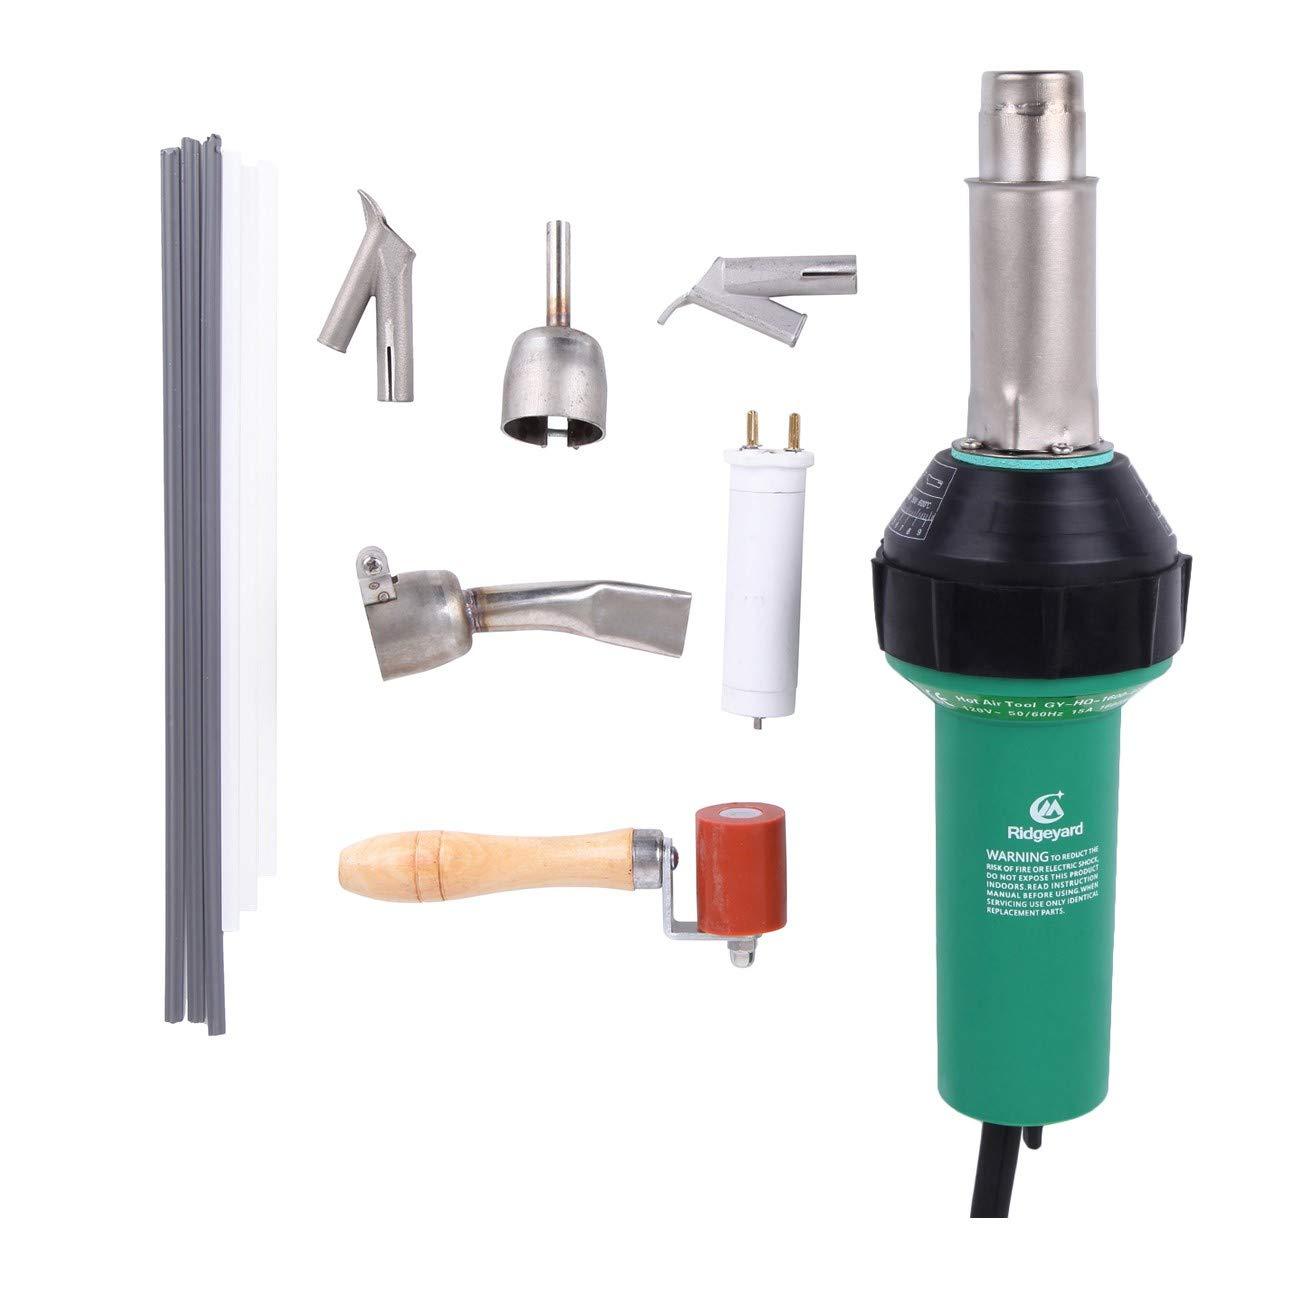 Ridgeyard Professional 110V 1600W Plastic Welder/Welding Hot Air Gun Hot Air Torch Plastic Welding Gun Welder Pistol